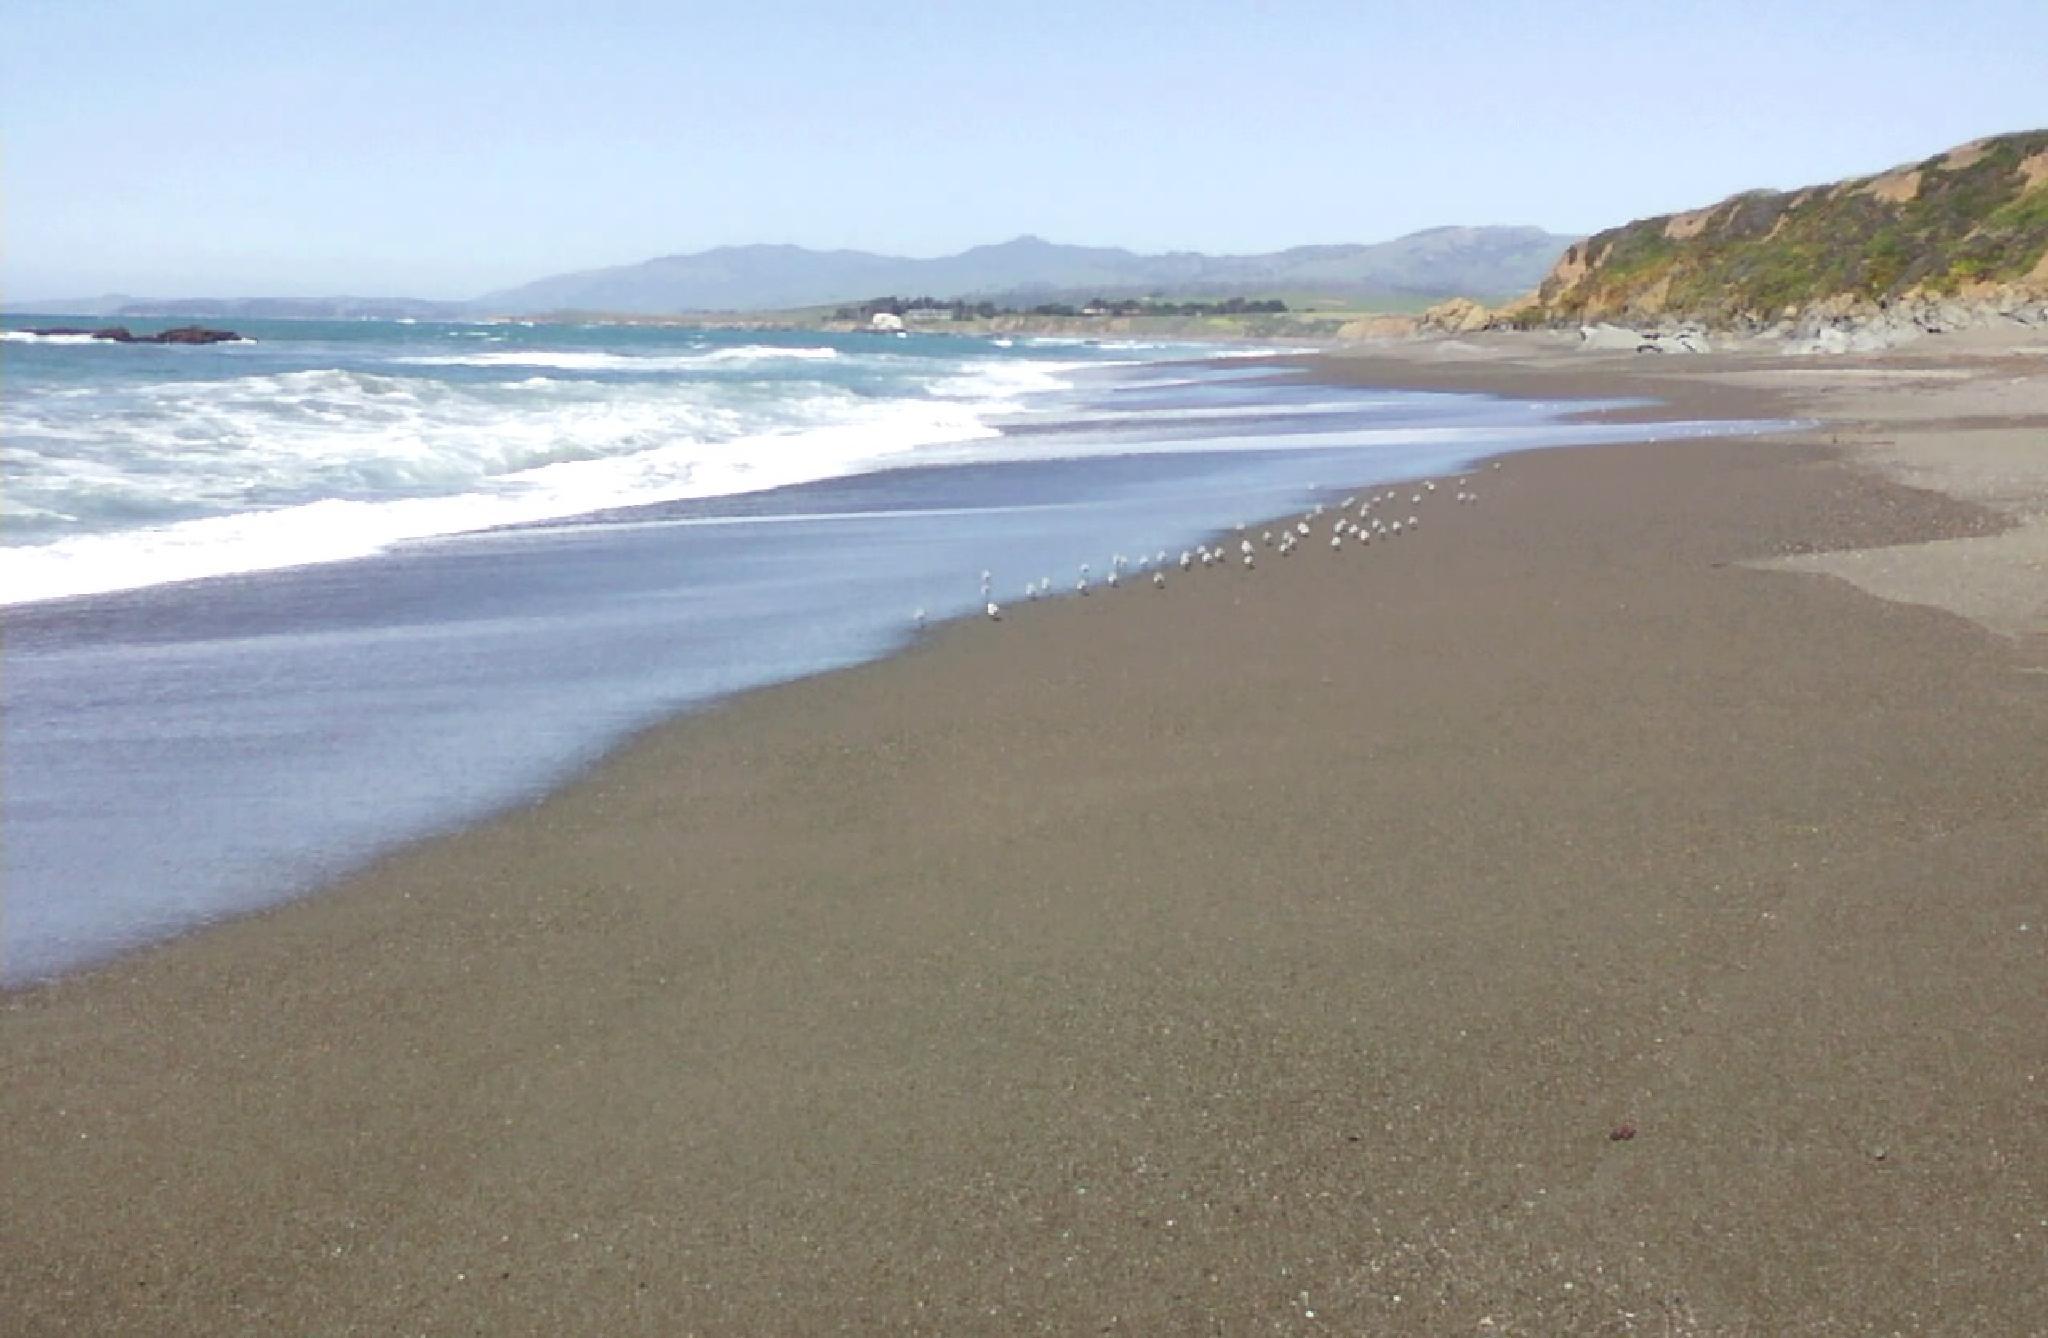 Birds on a Beach, Cambria California by Cherylina